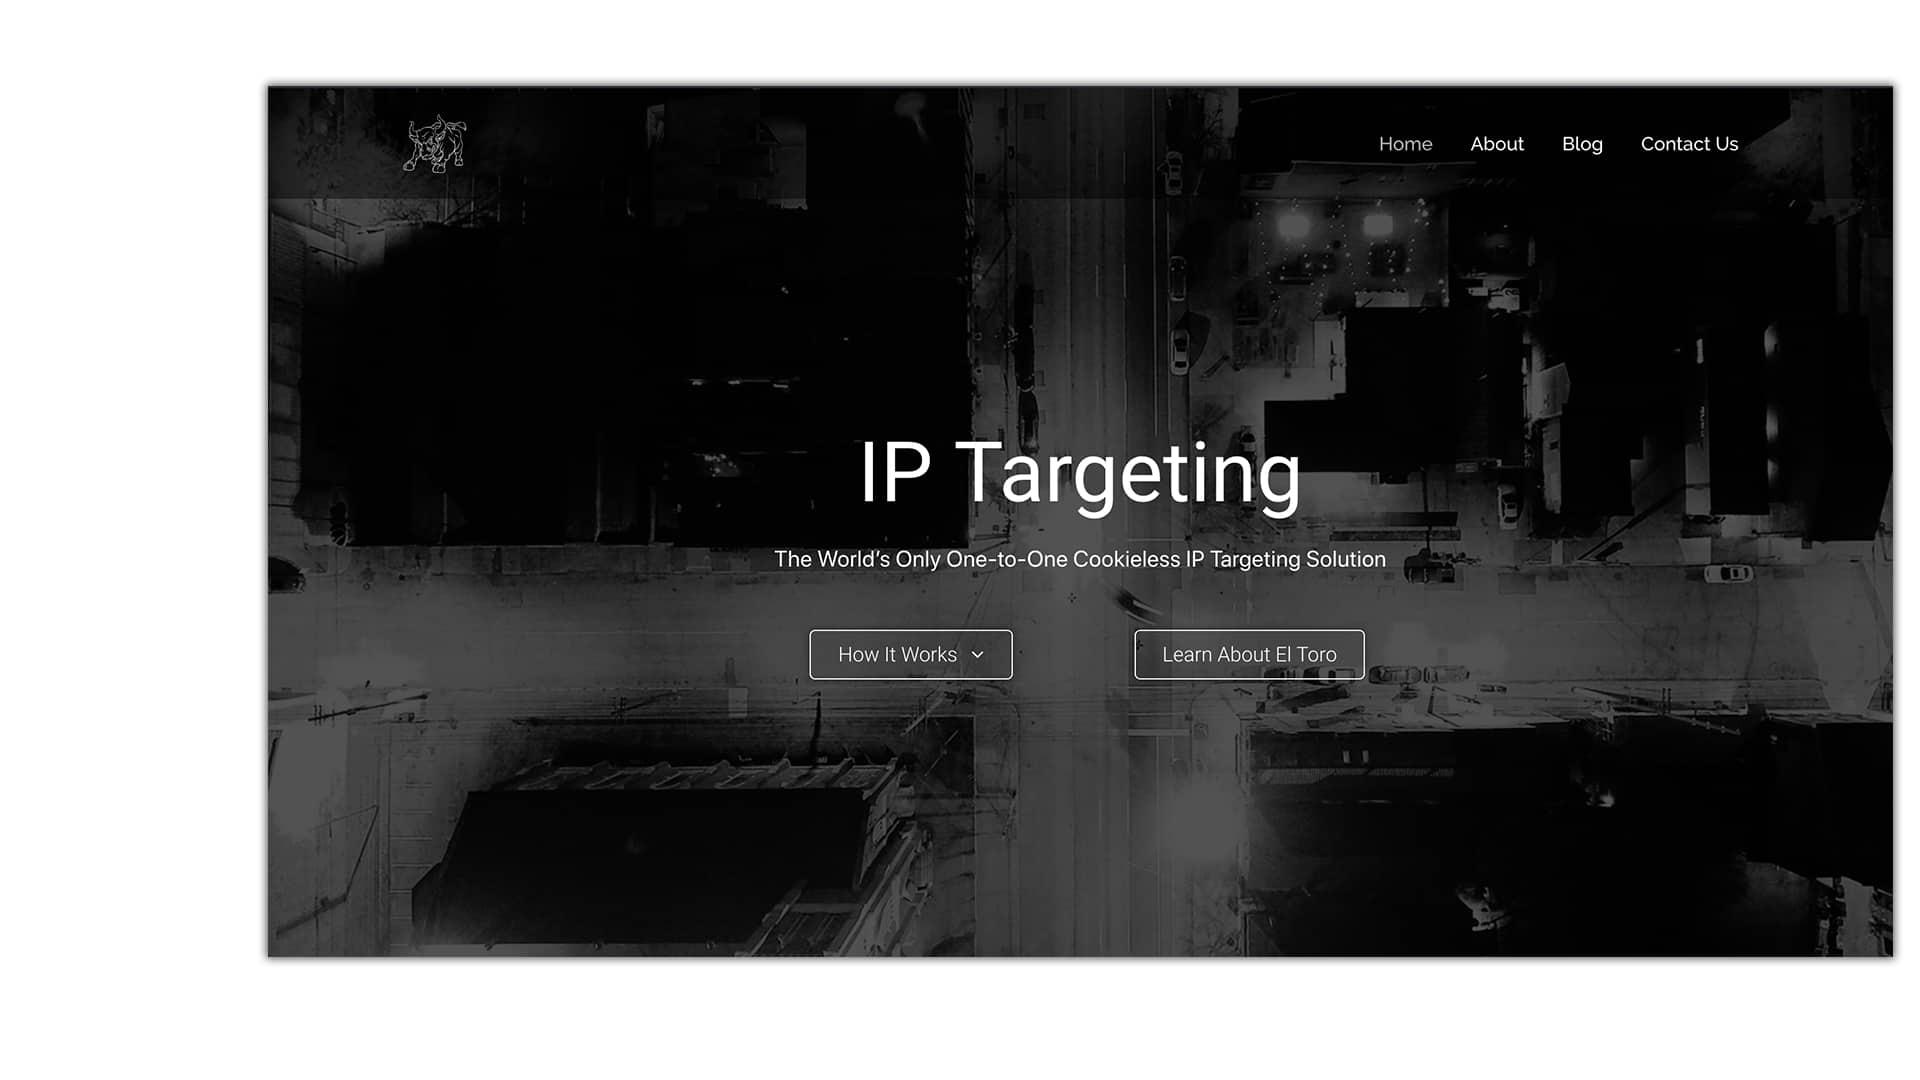 iptargeting.com